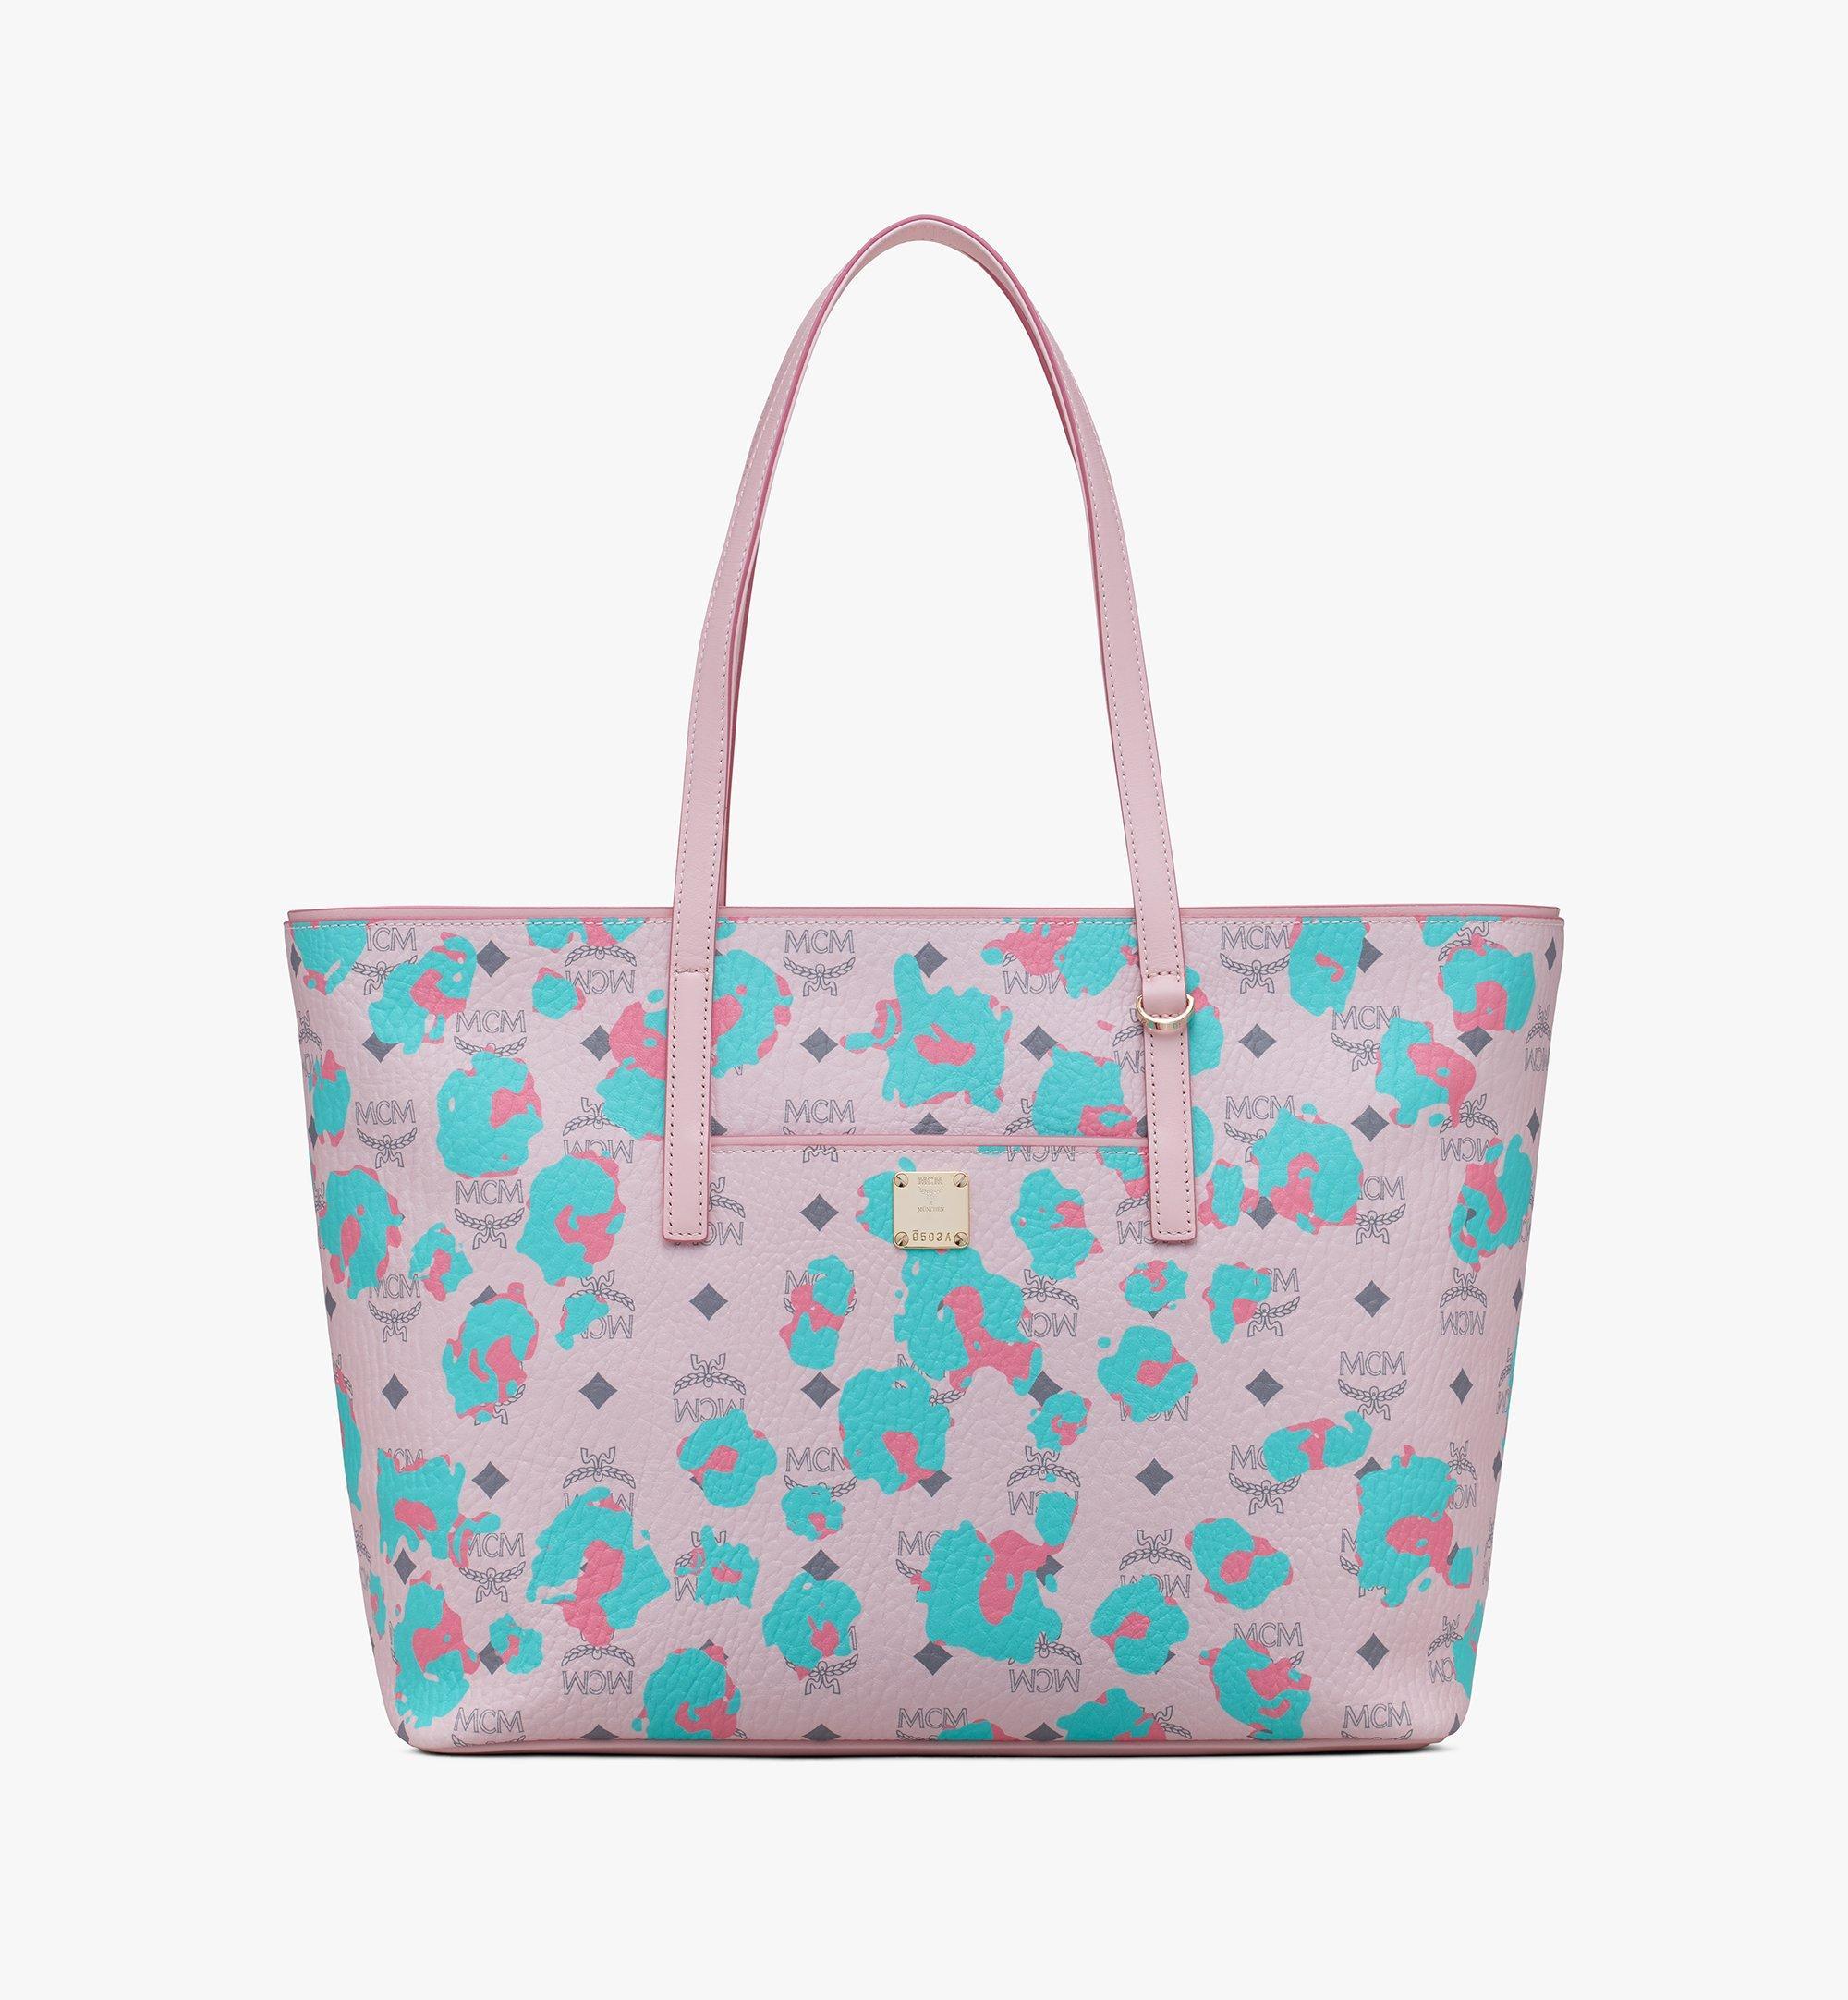 MCM 碎花豹紋Anya購物袋 Pink MWPASVI03QI001 更多視圖 1